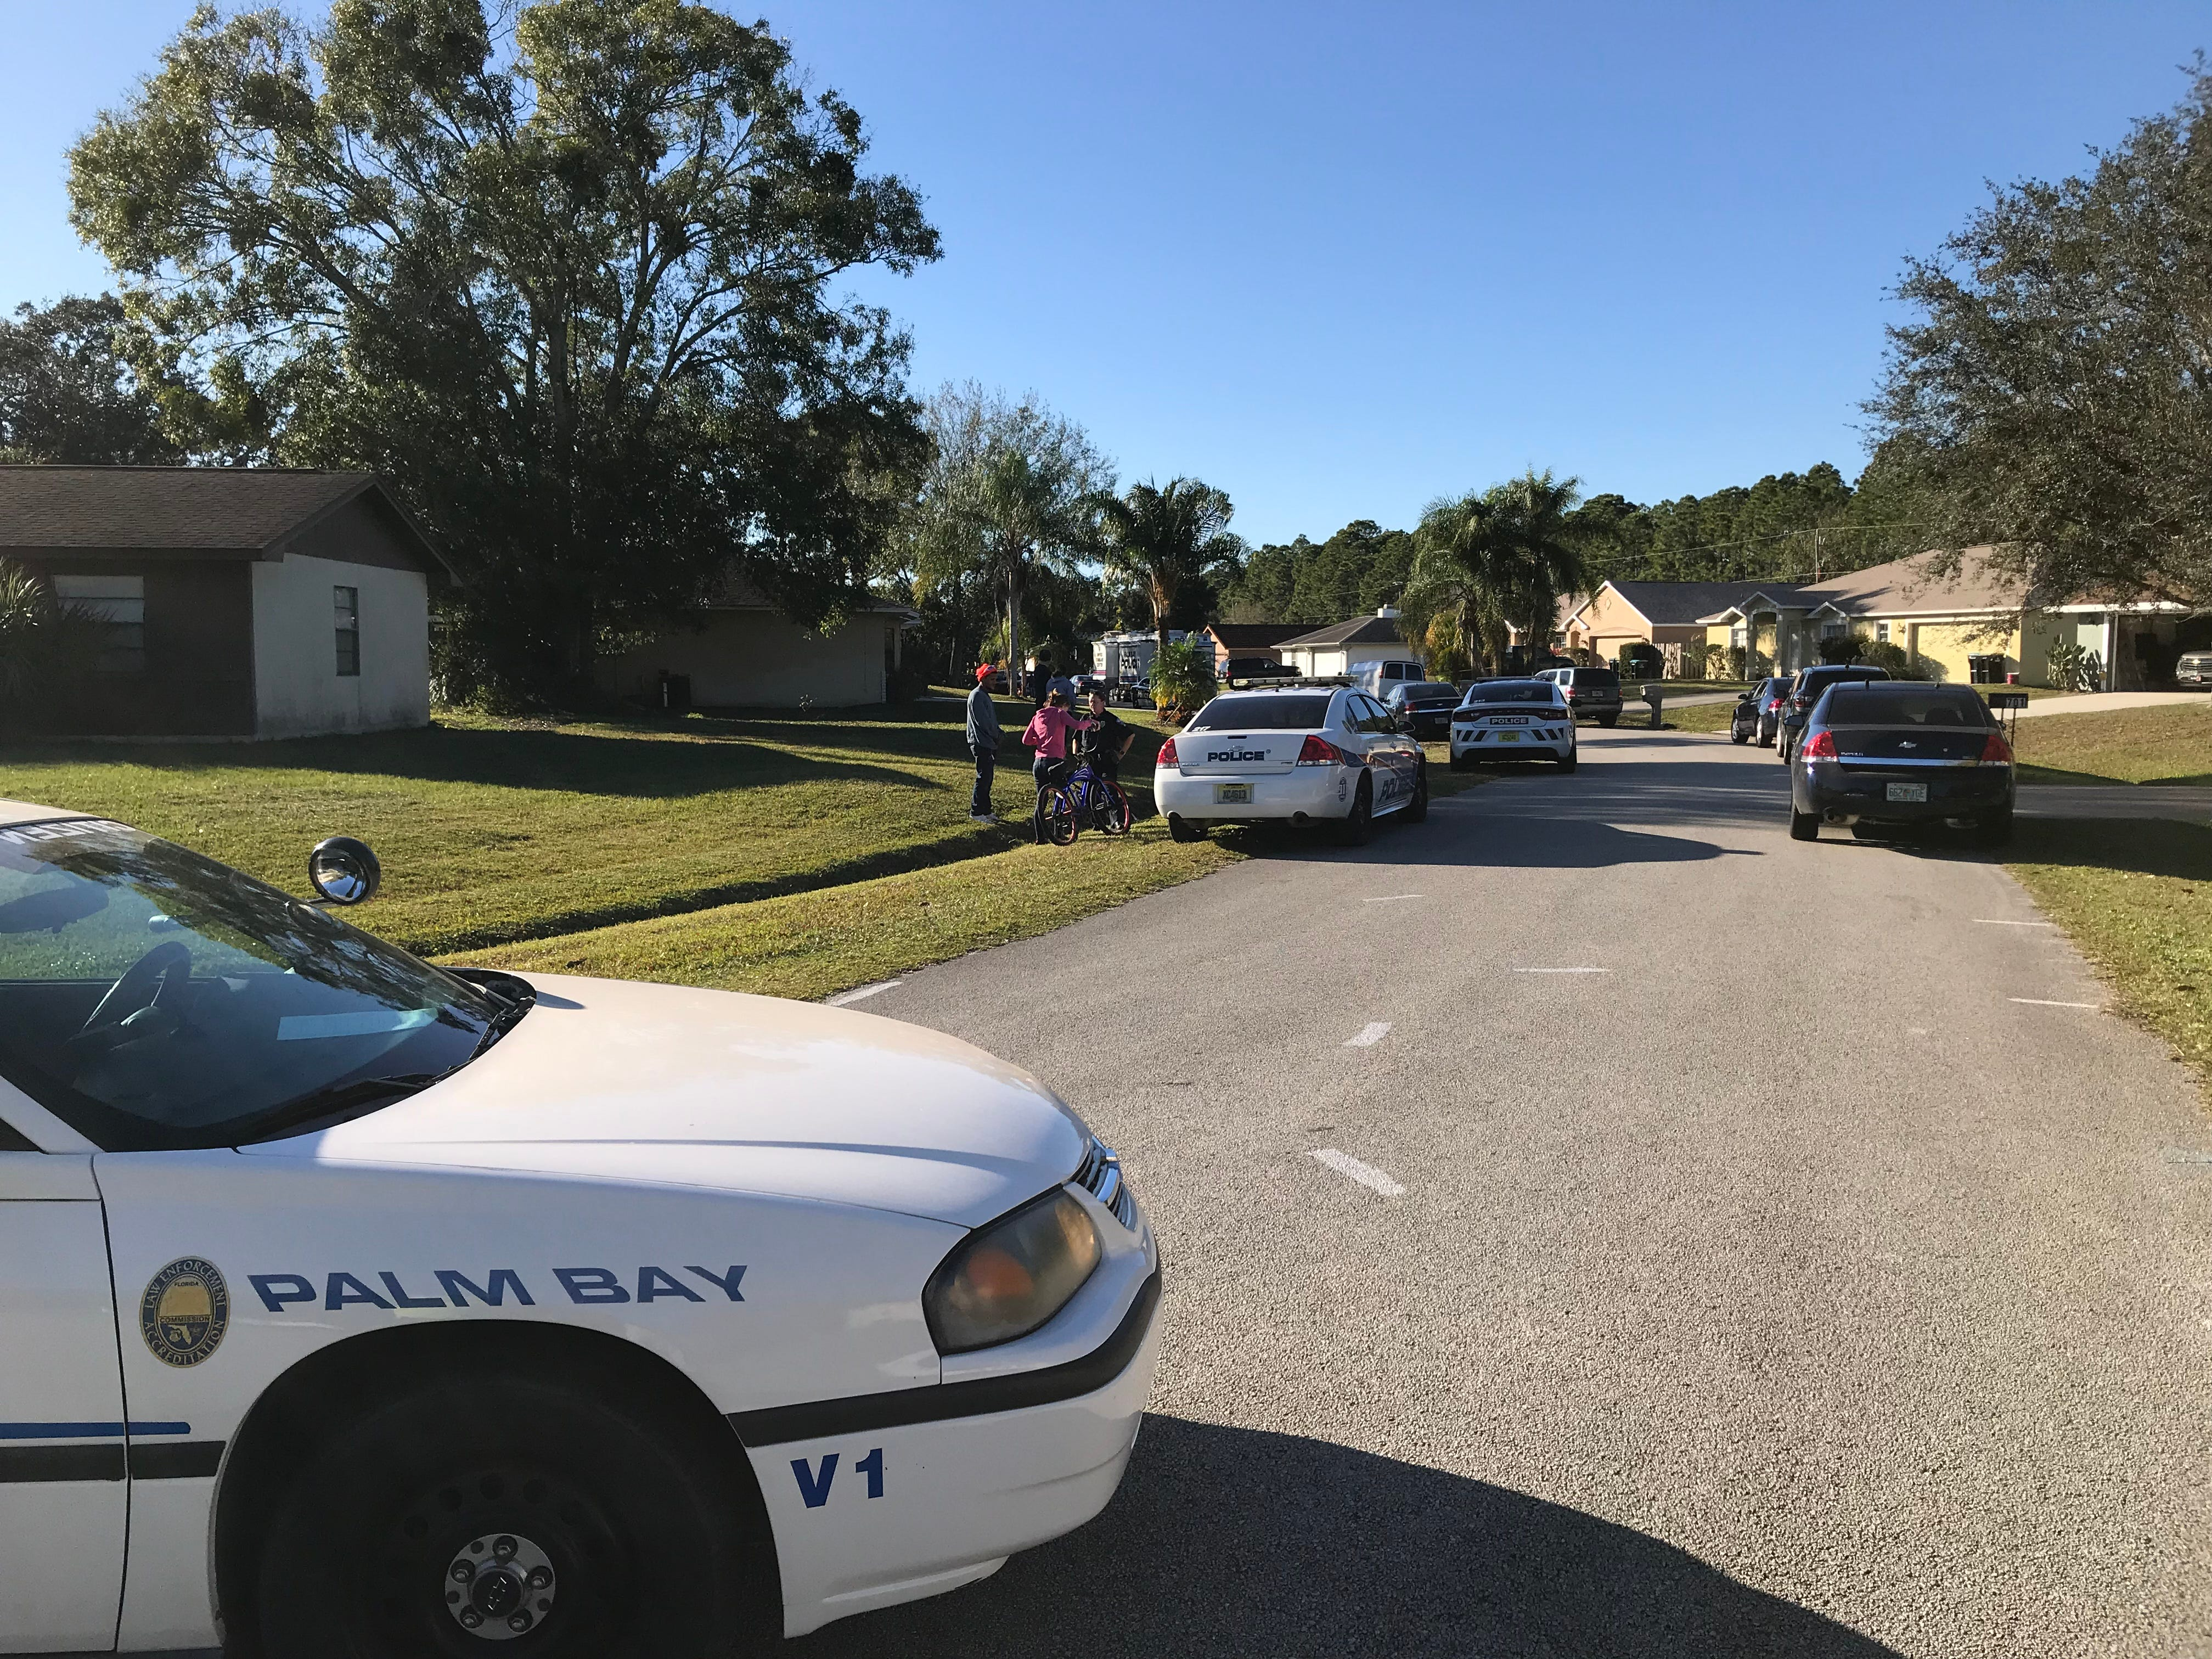 Palm Bay police investigate a shooting scene on Thursday, Jan. 10, 2019.